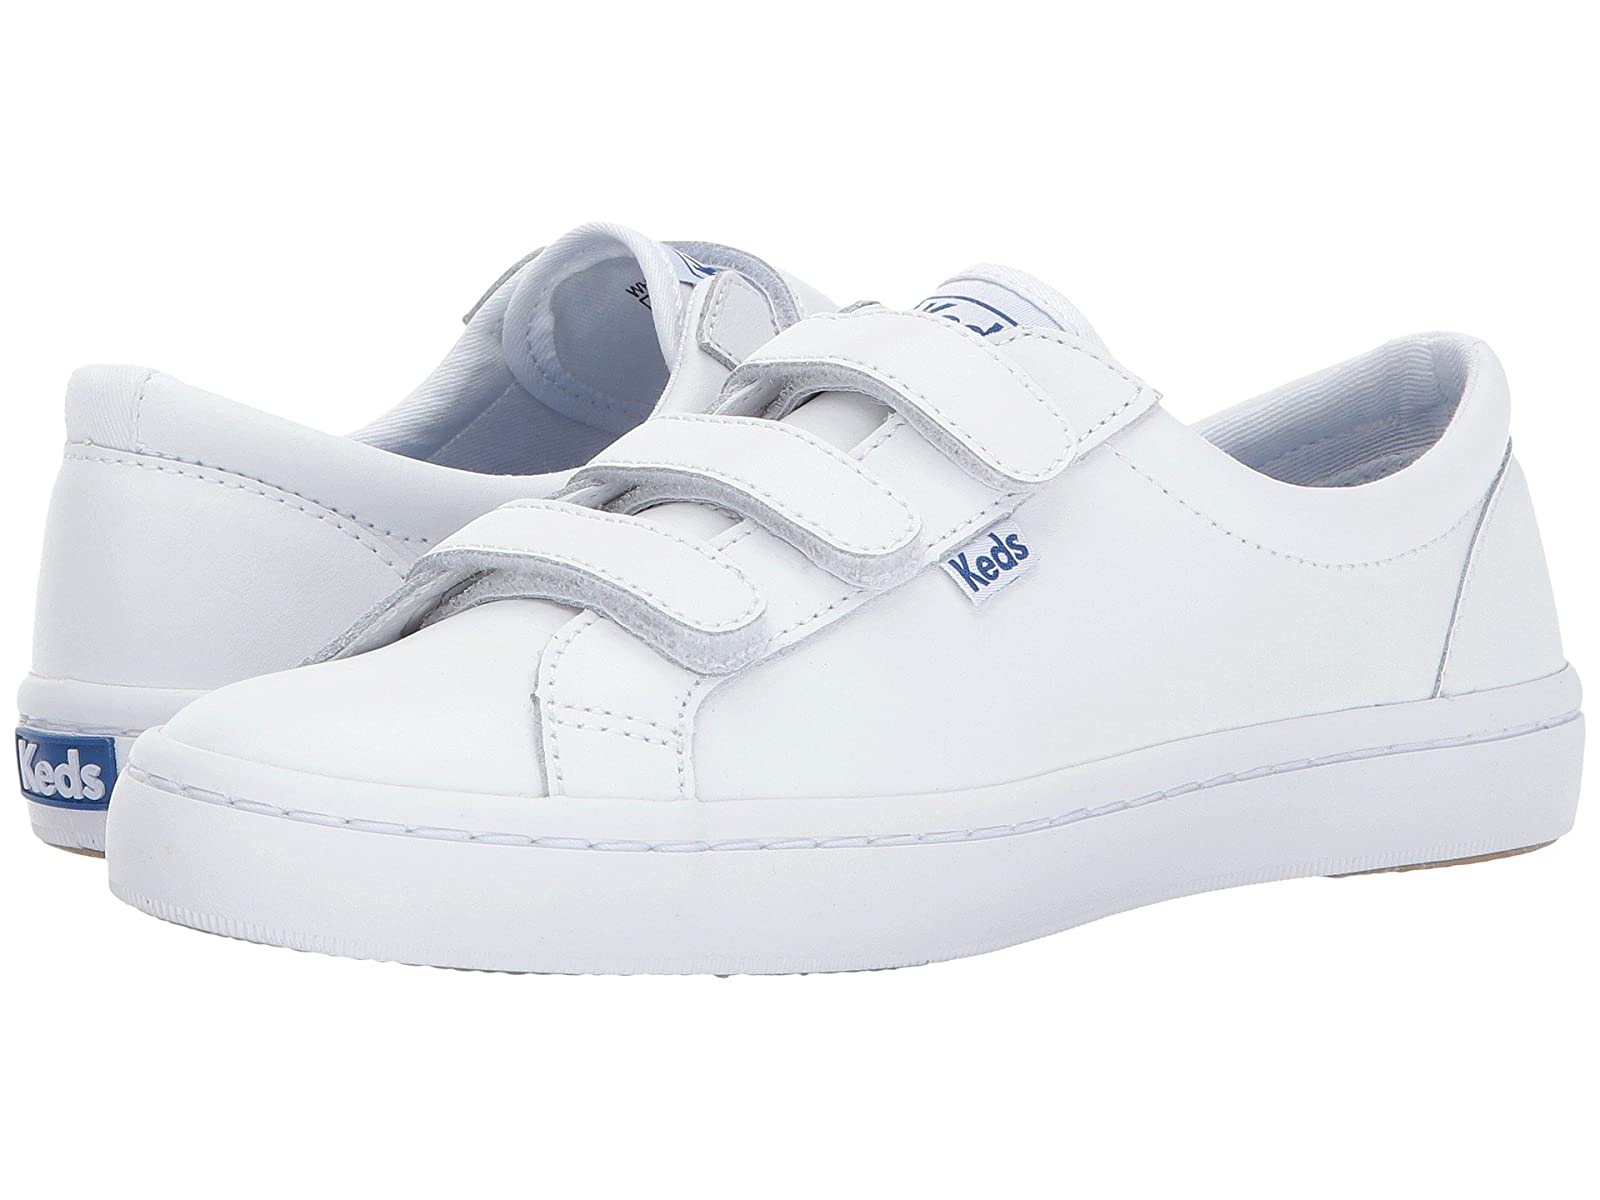 Keds Tiebreak LeatherAtmospheric grades have affordable shoes